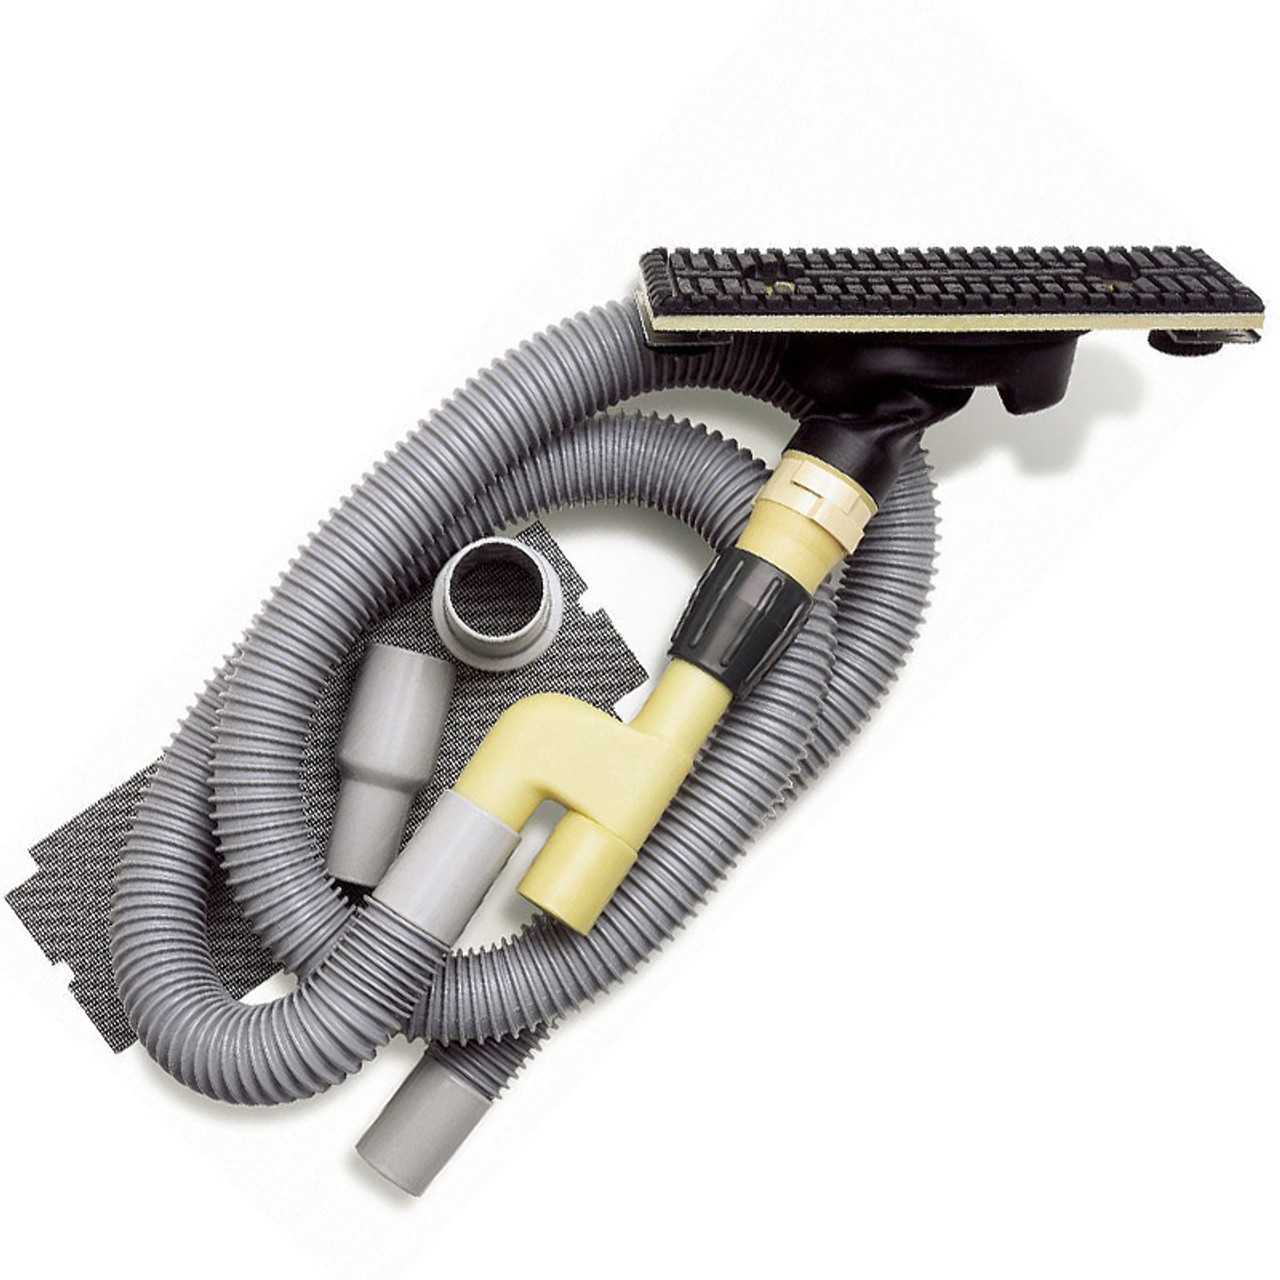 HYDE 09165 Vacuum Hand Sander Kit,5 Pc